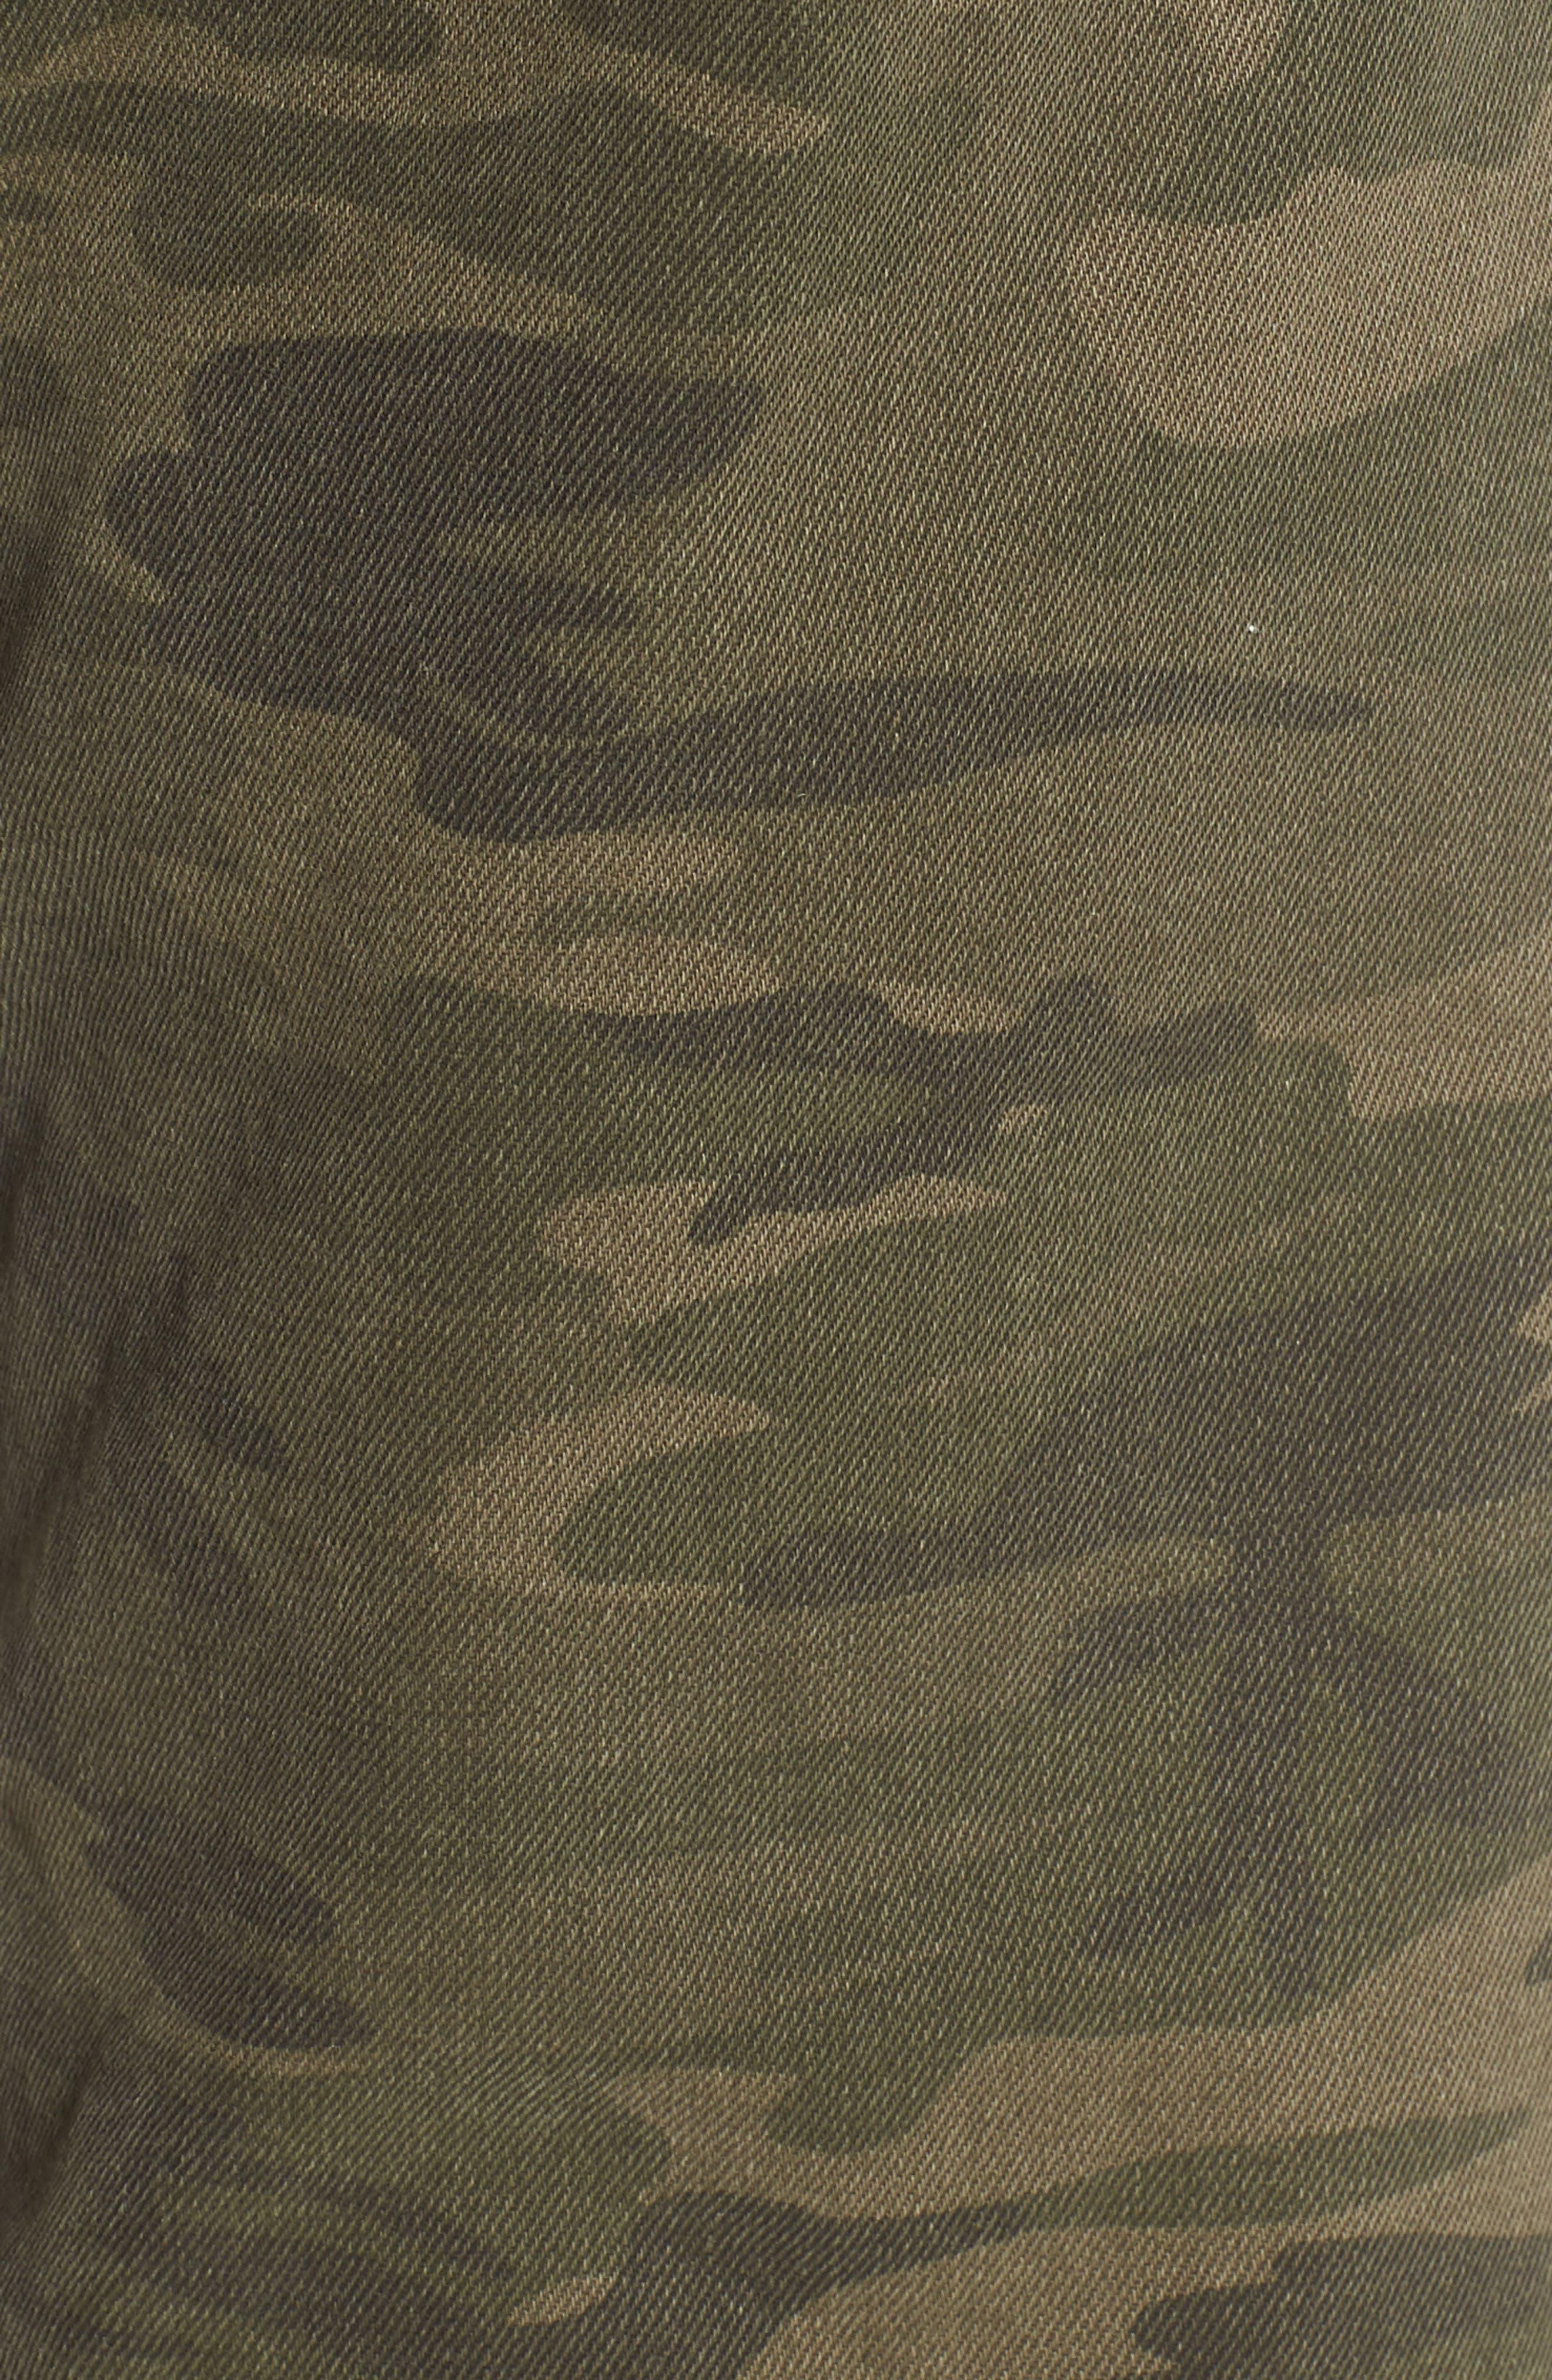 Camo Wide Leg Trousers,                             Alternate thumbnail 6, color,                             300